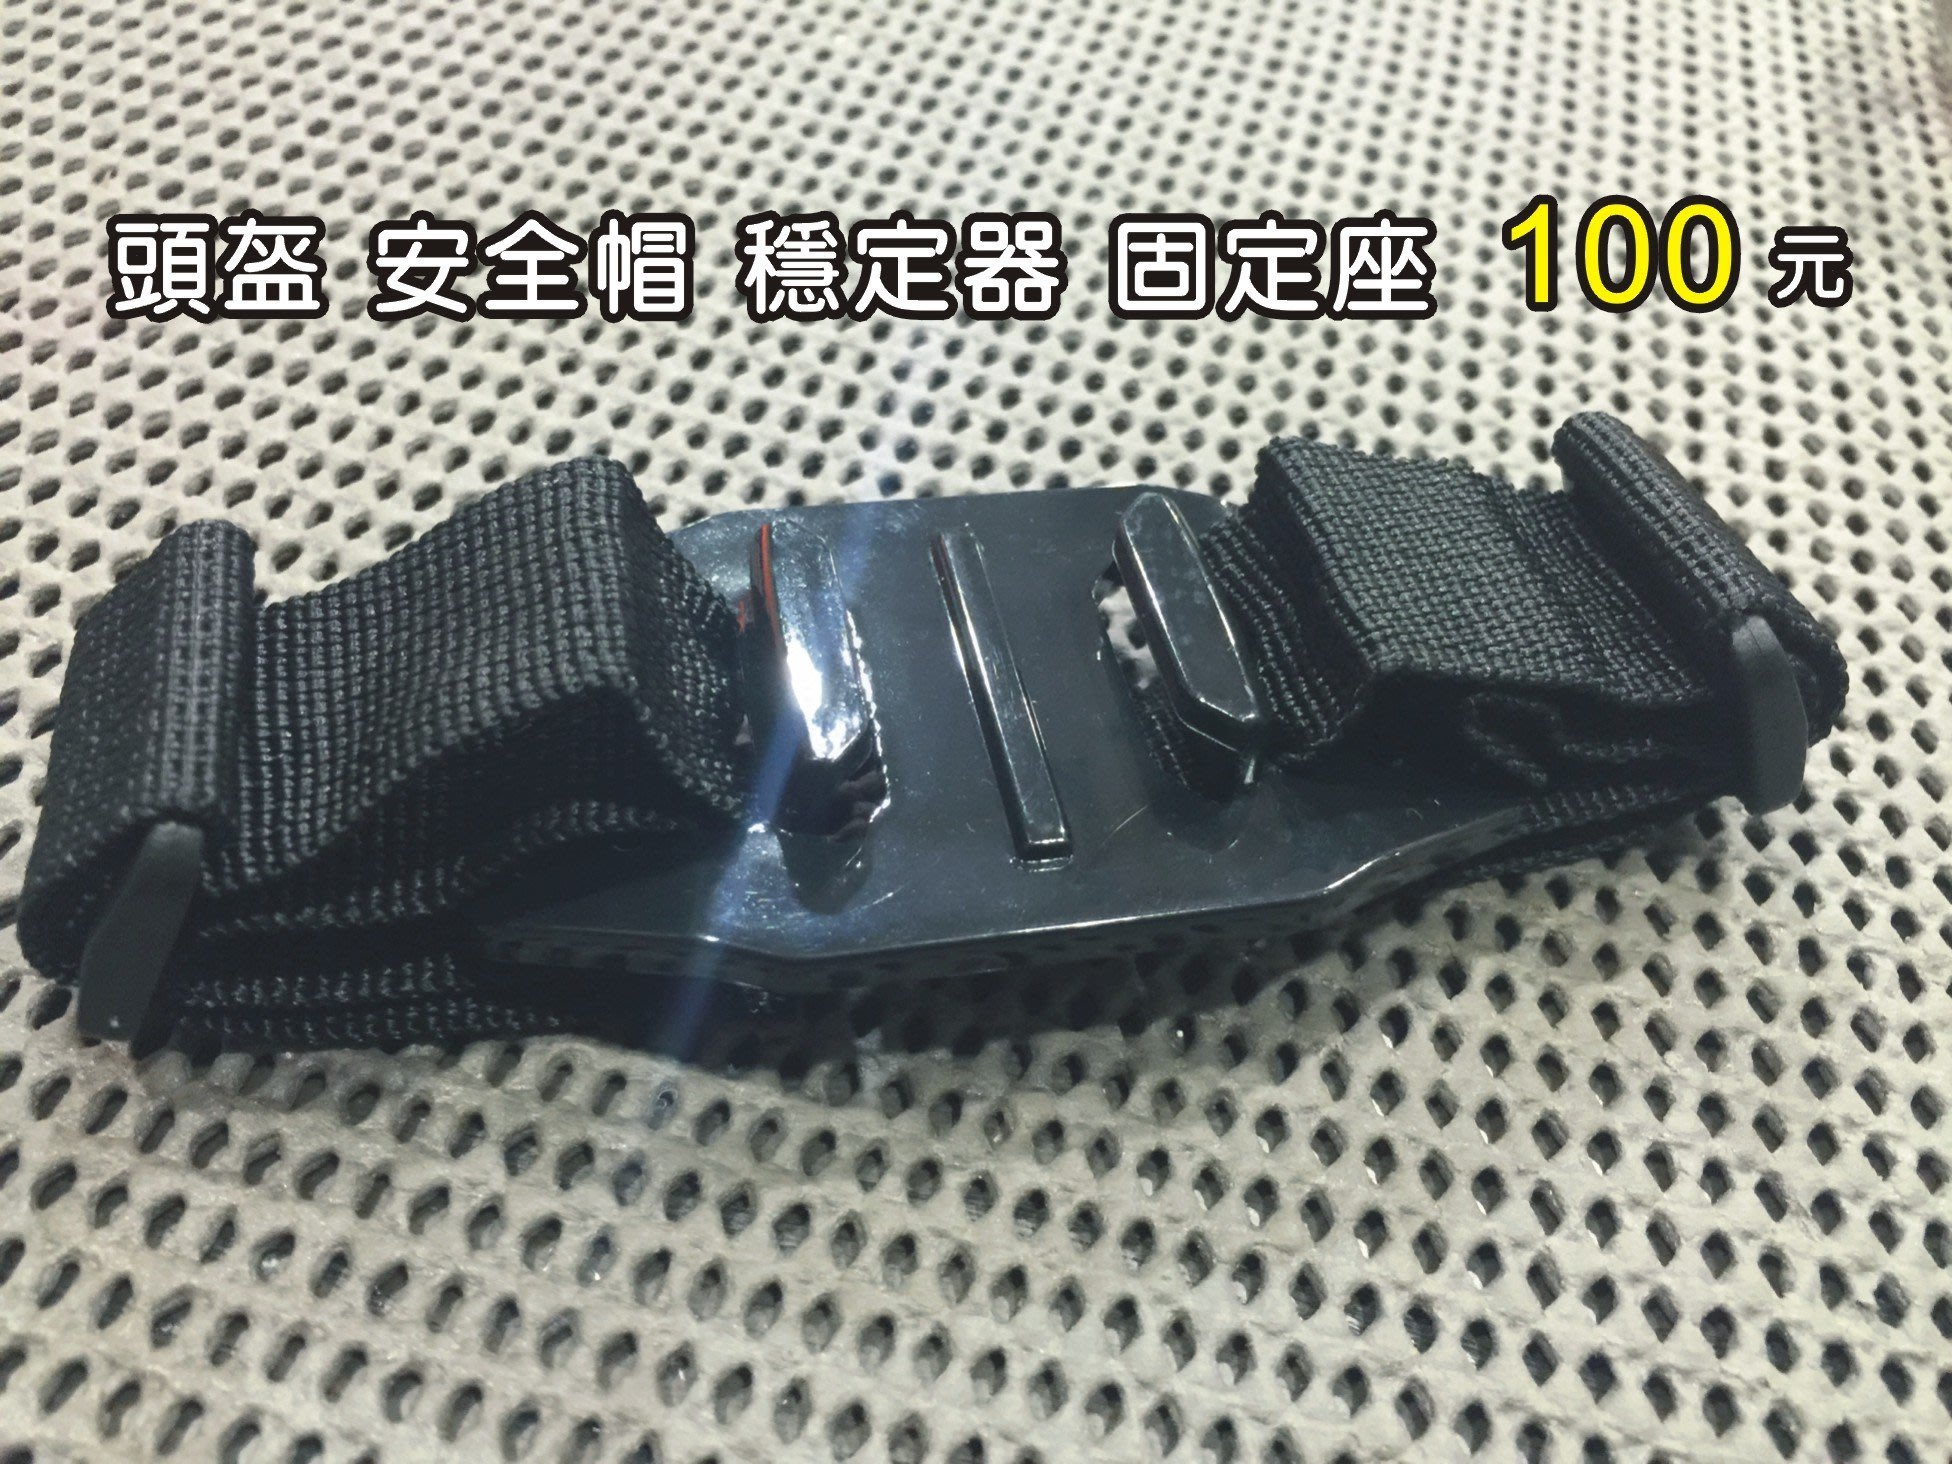 5mj.tw GOPRO 頭盔帶 固定鎖 金屬框 hero4 hero3 多角度固定組iphone6s也可夾SJ4000